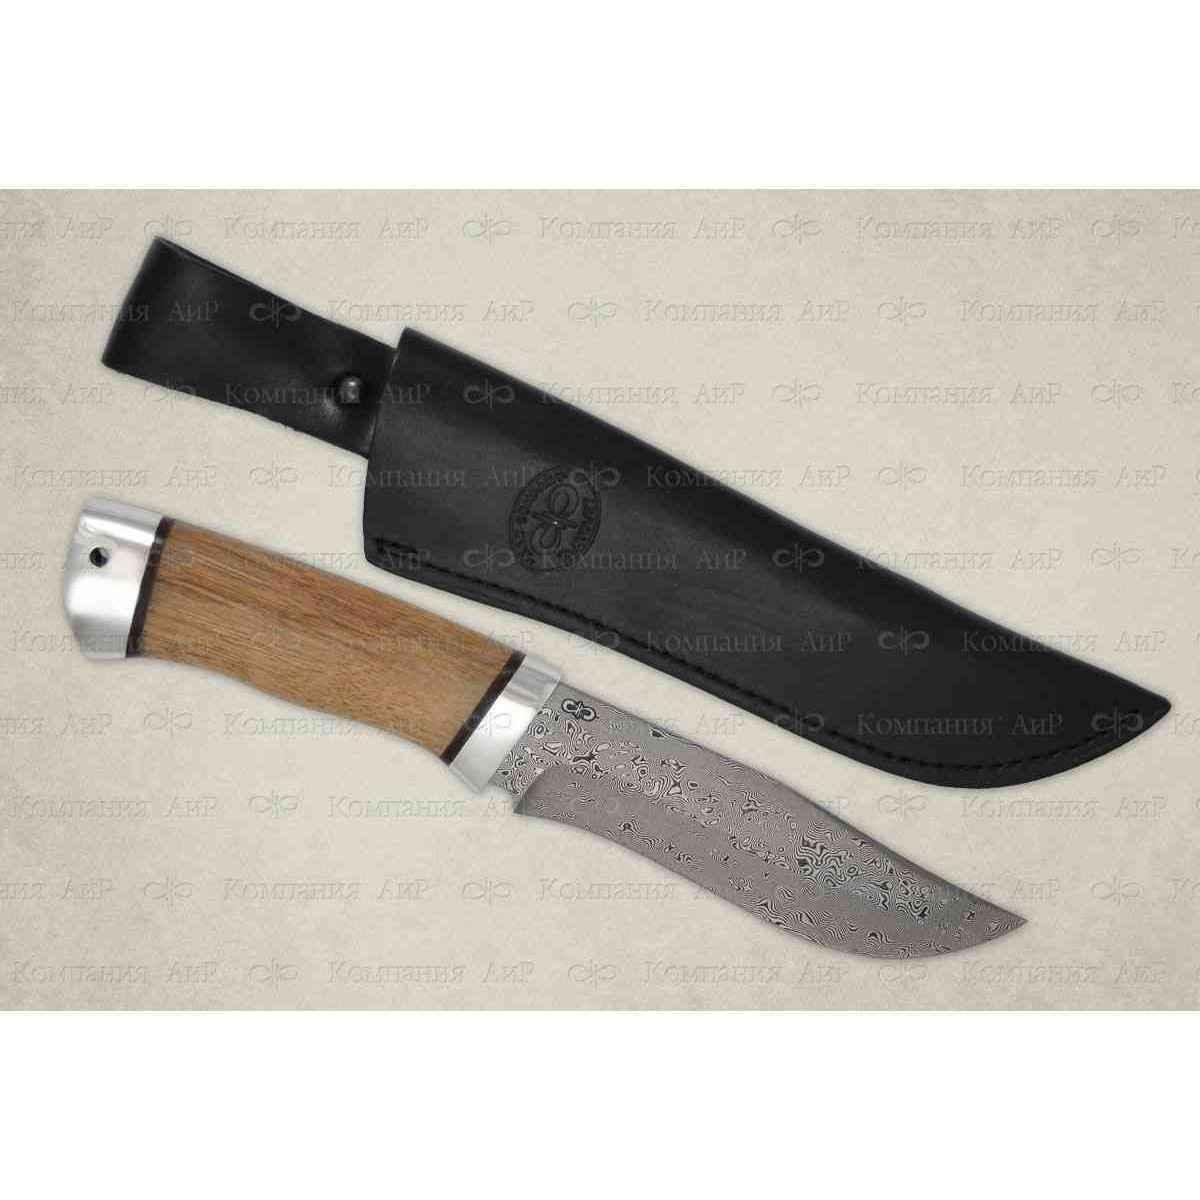 цена на Нож разделочный АиР